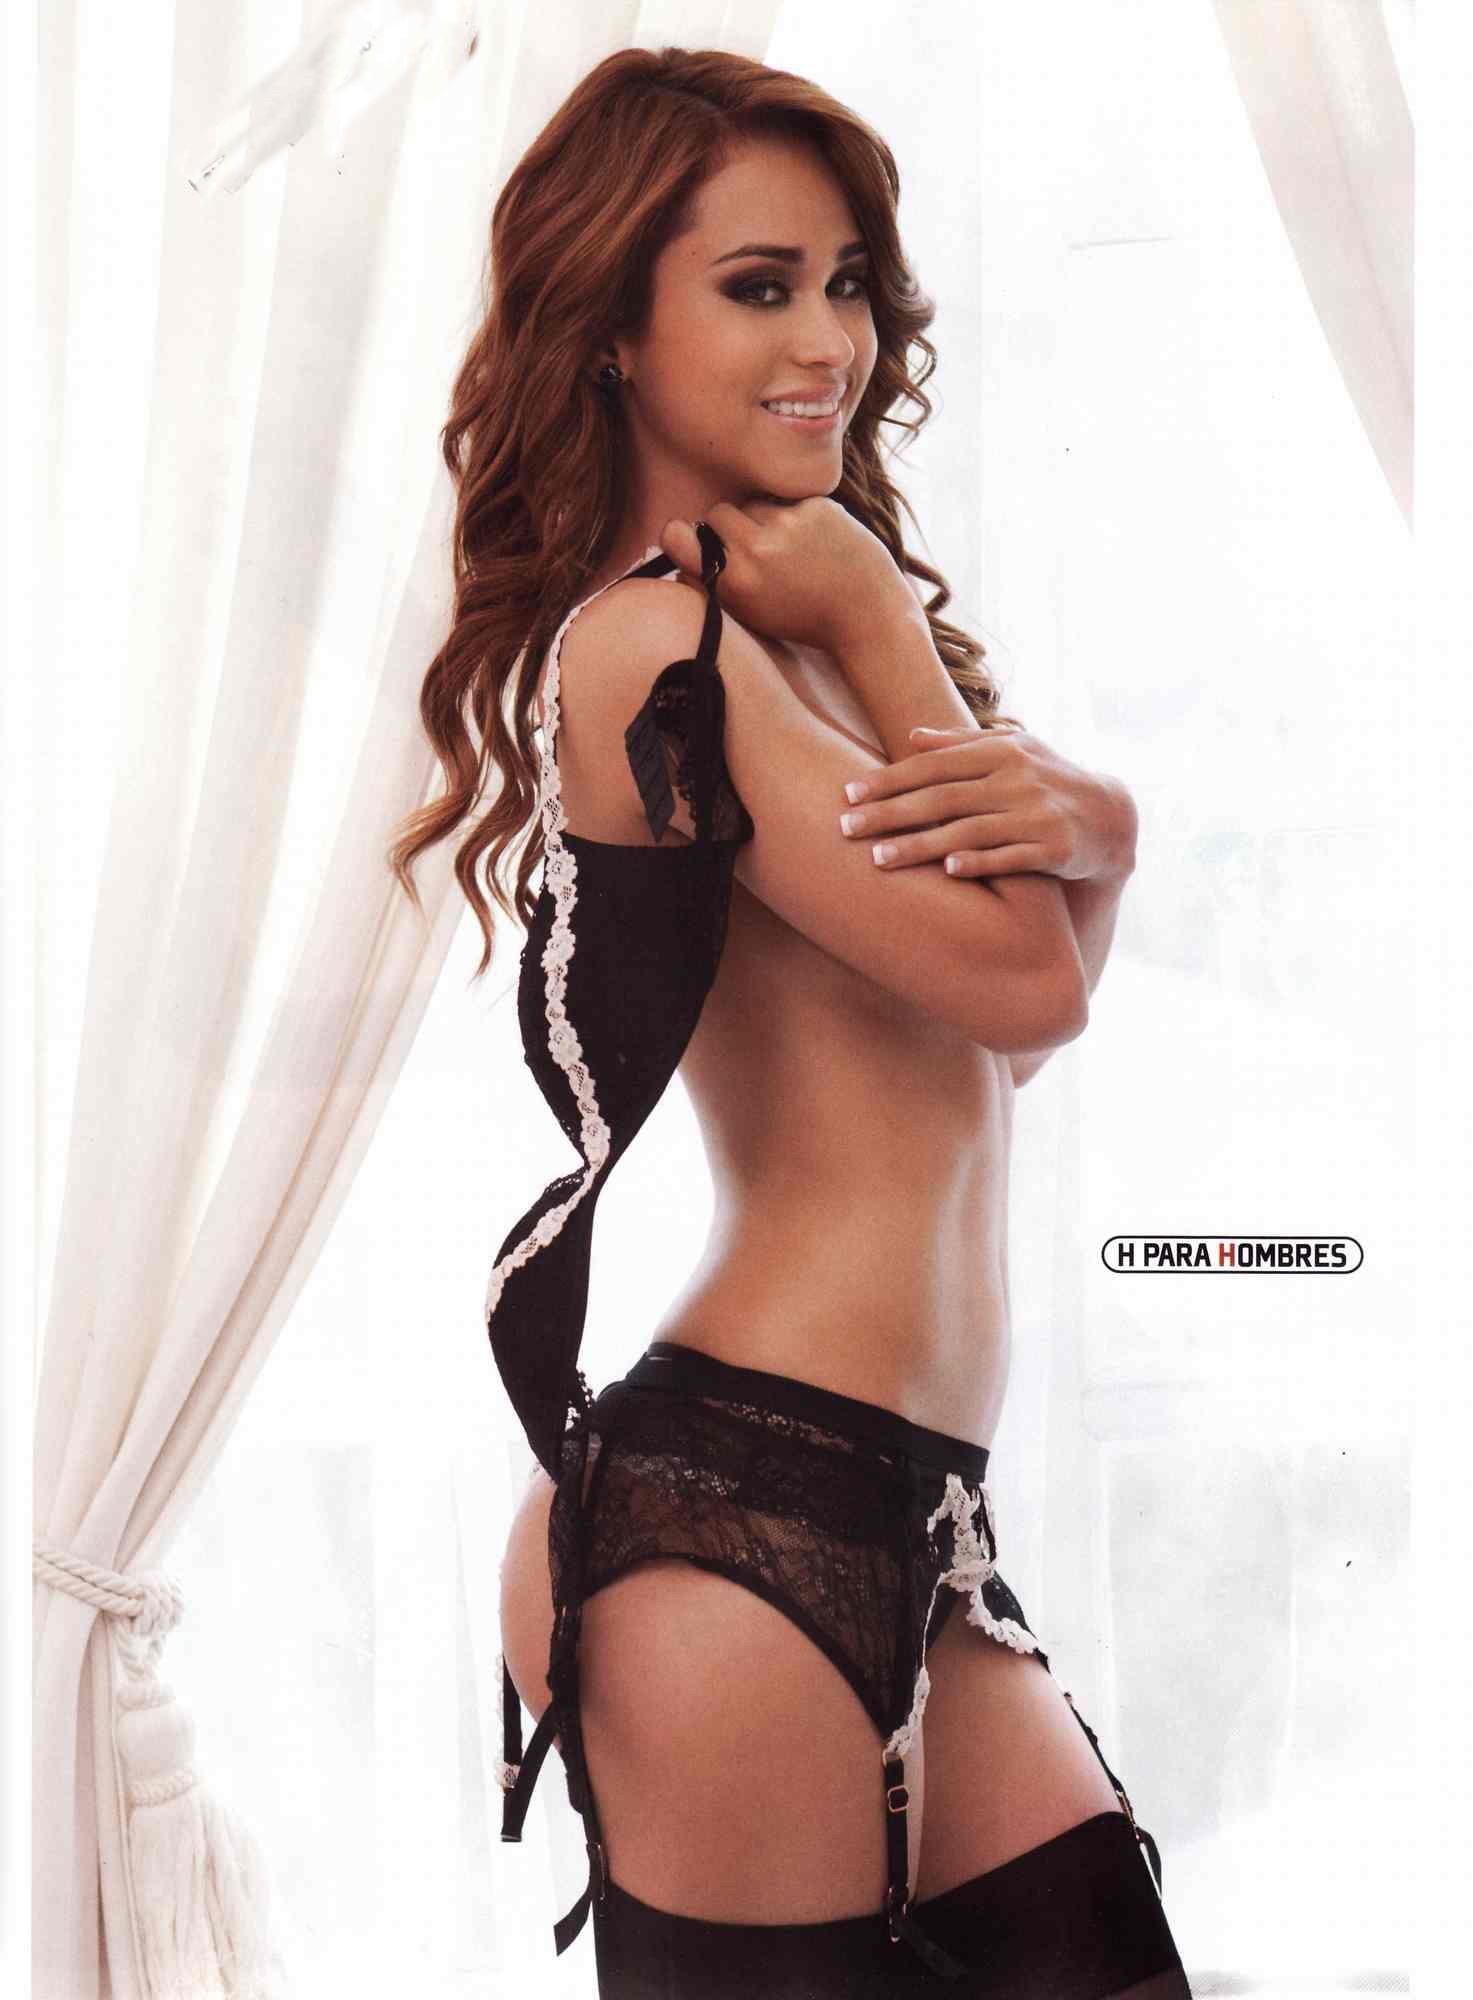 Yanet Garcia sin ropa interior 1